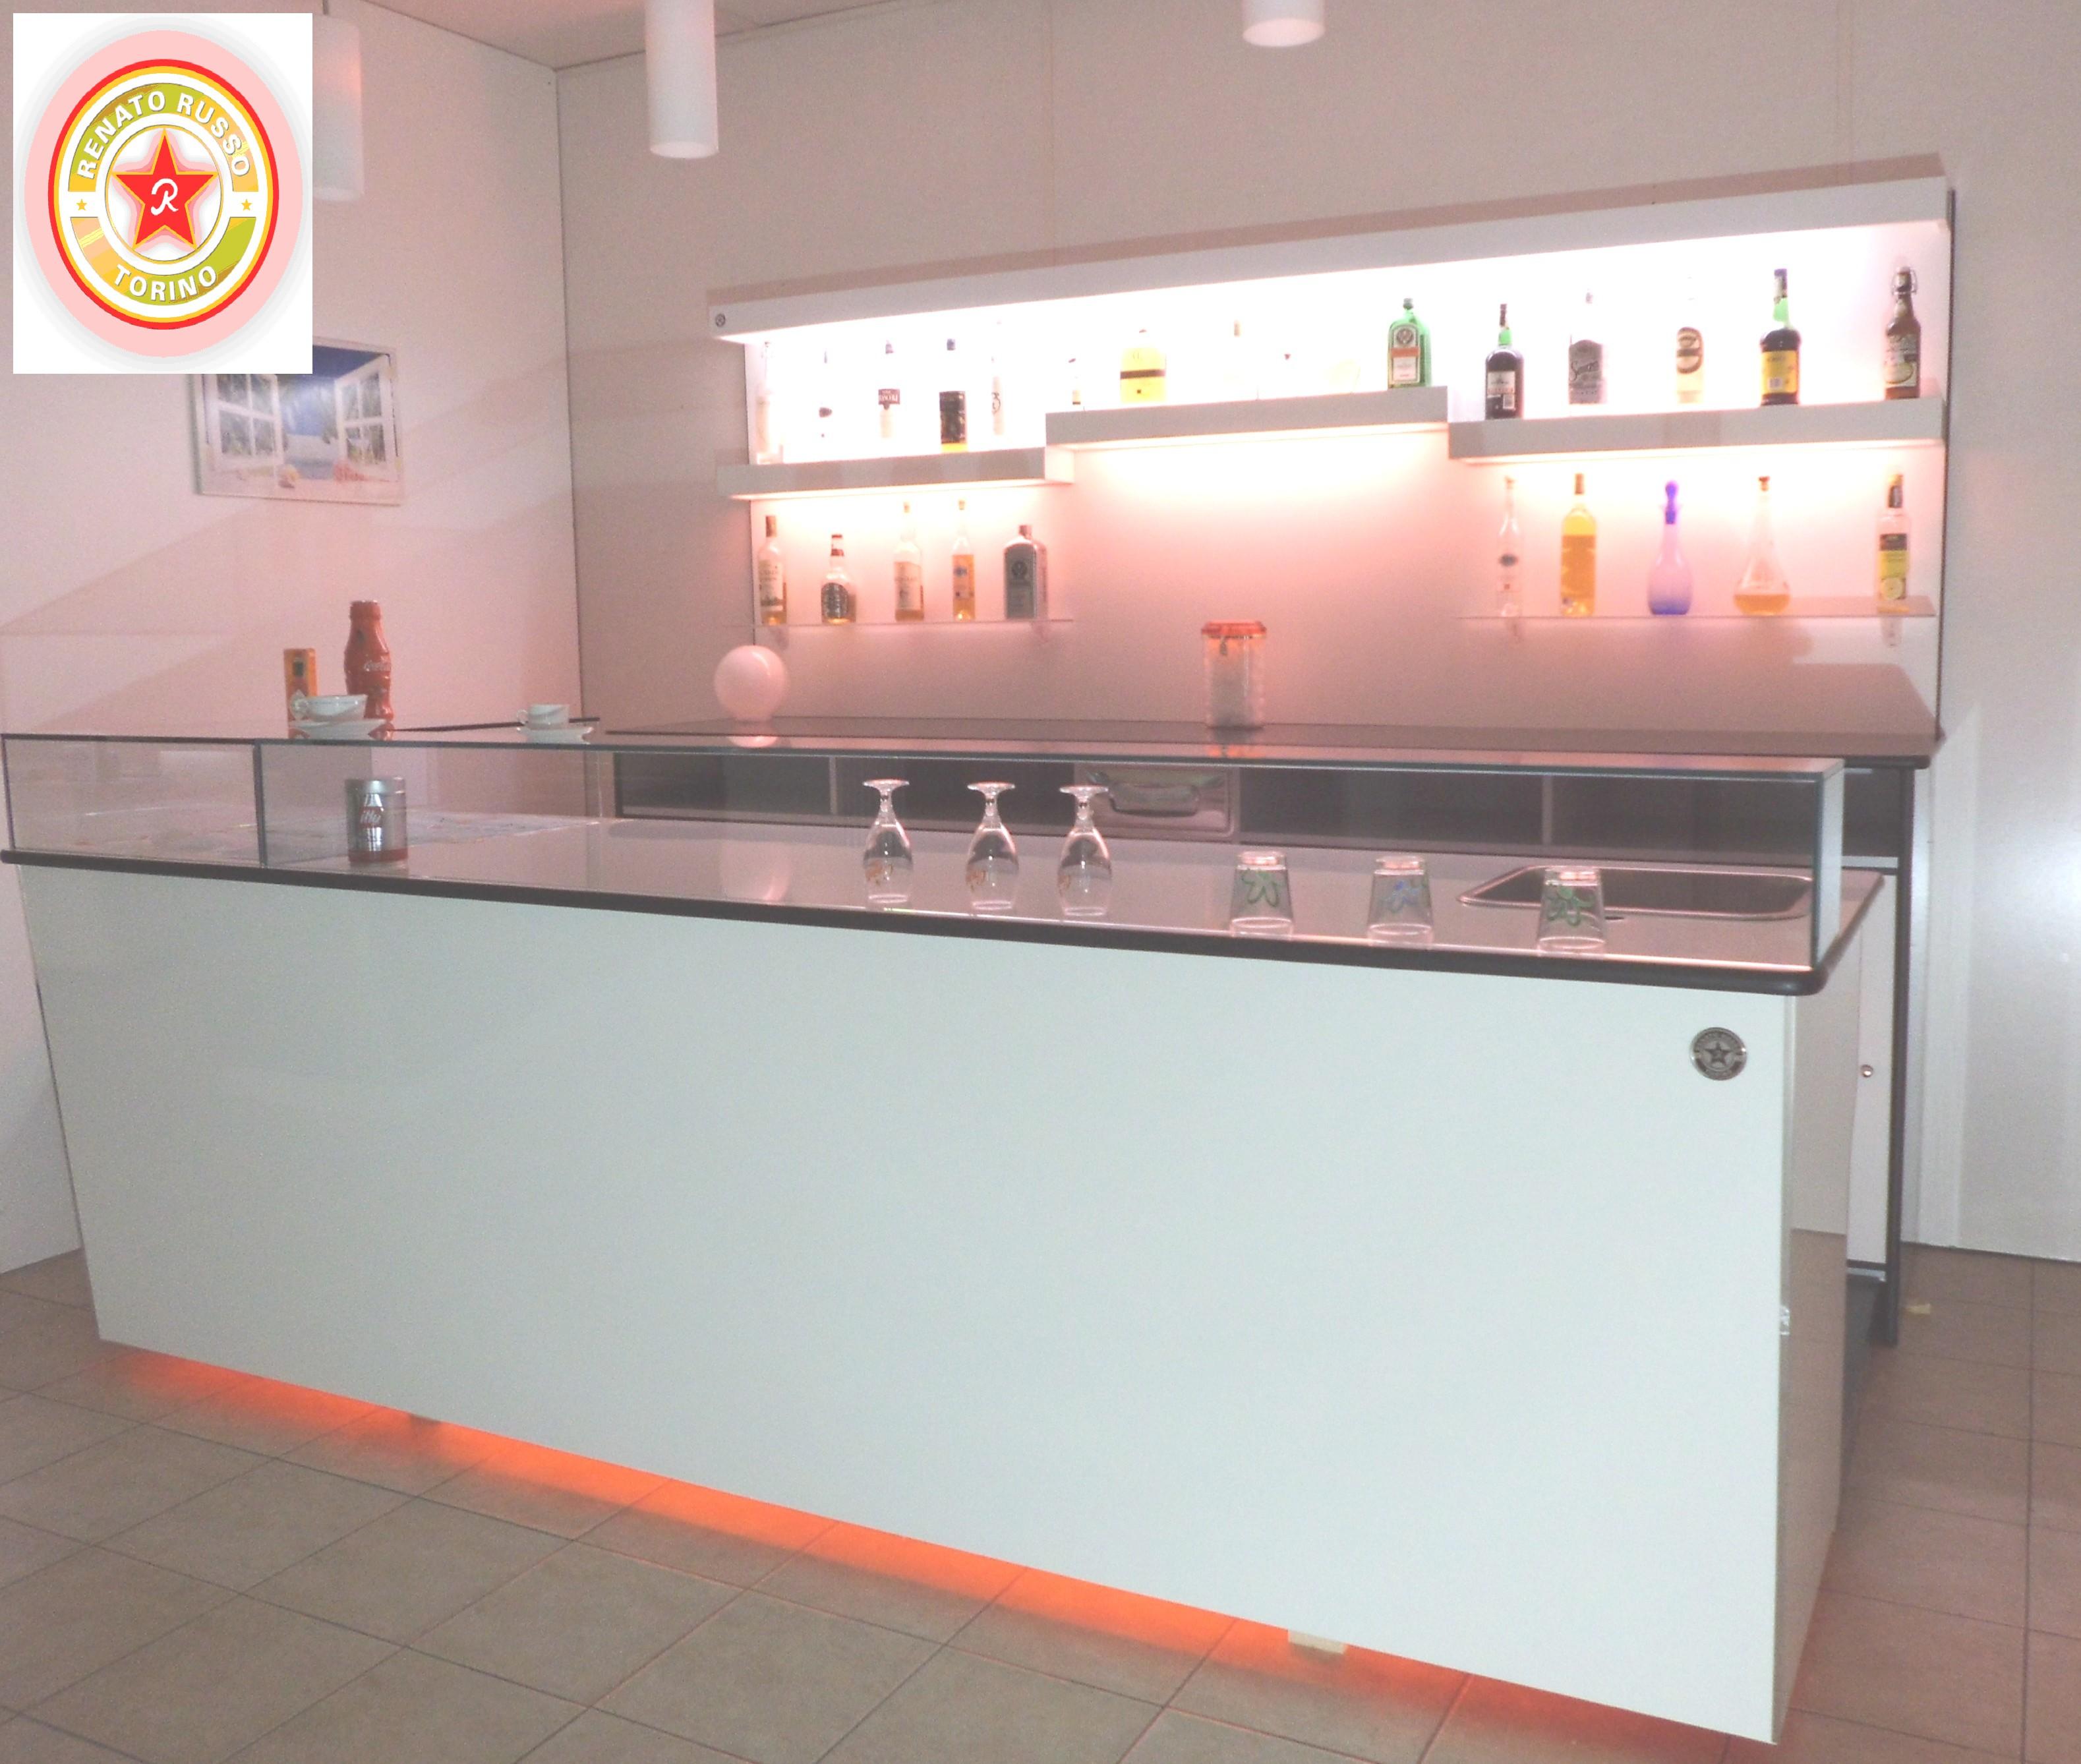 Banco bar milano bistr bancone banco bar white banco for Arredamento per bar prezzi